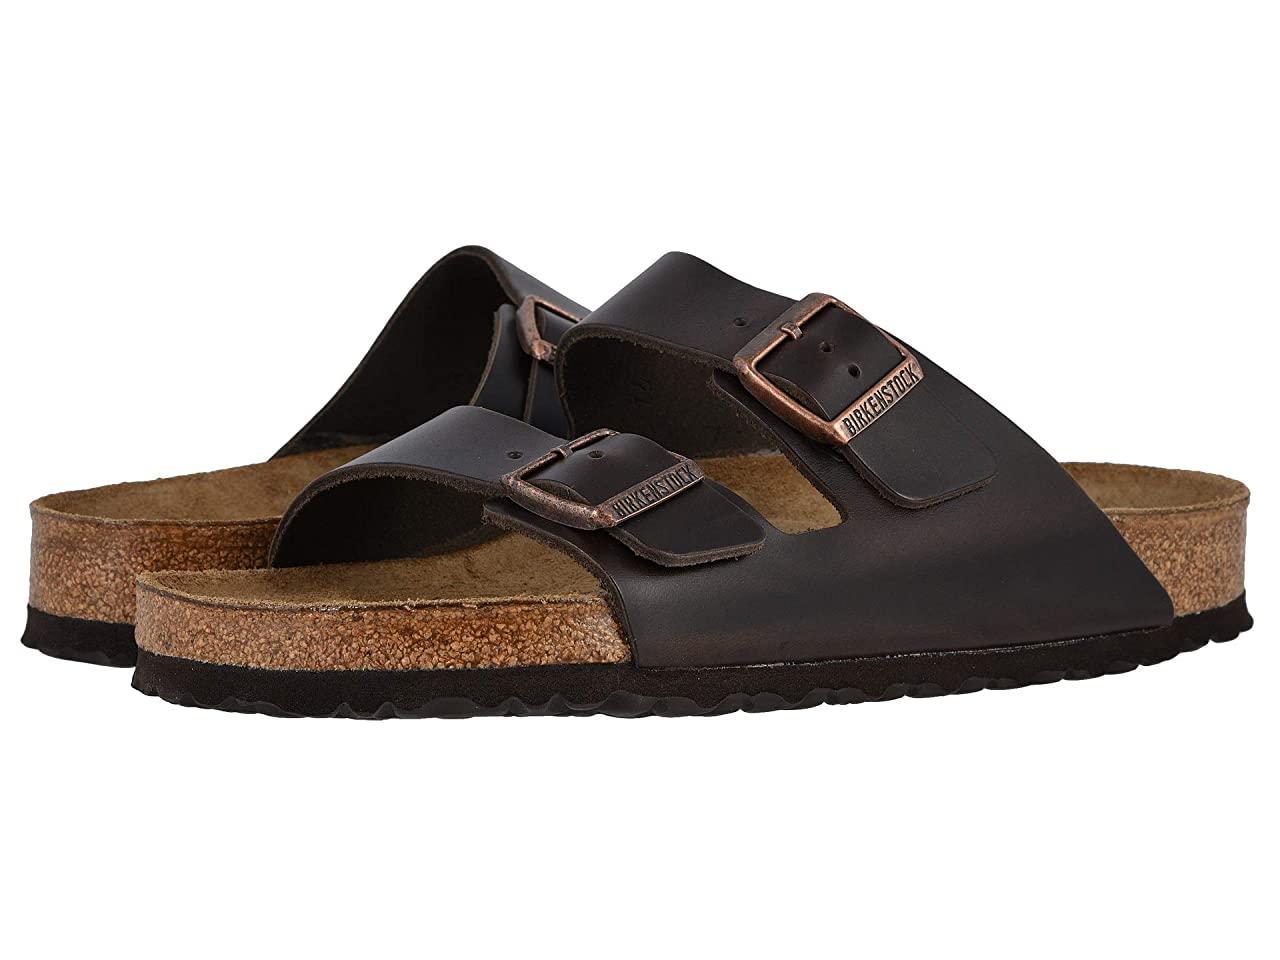 Сандали/Вьетнамки (Оригинал) Birkenstock Arizona Soft Footbed - Leather (Unisex) Brown Amalfi Leather